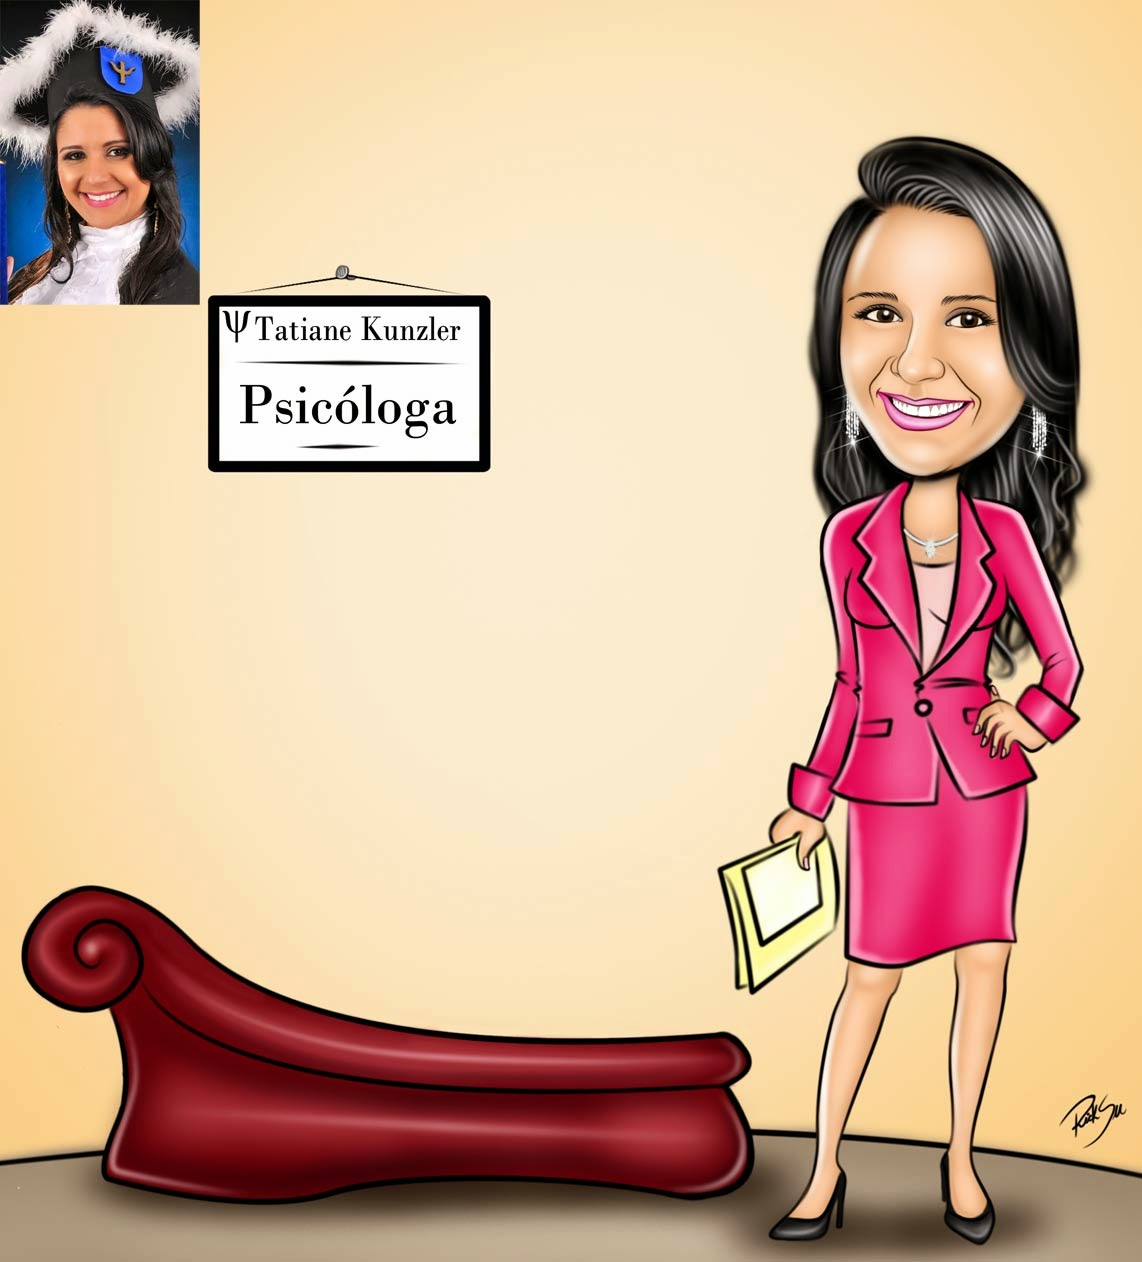 caricatura de formatura de psicologia